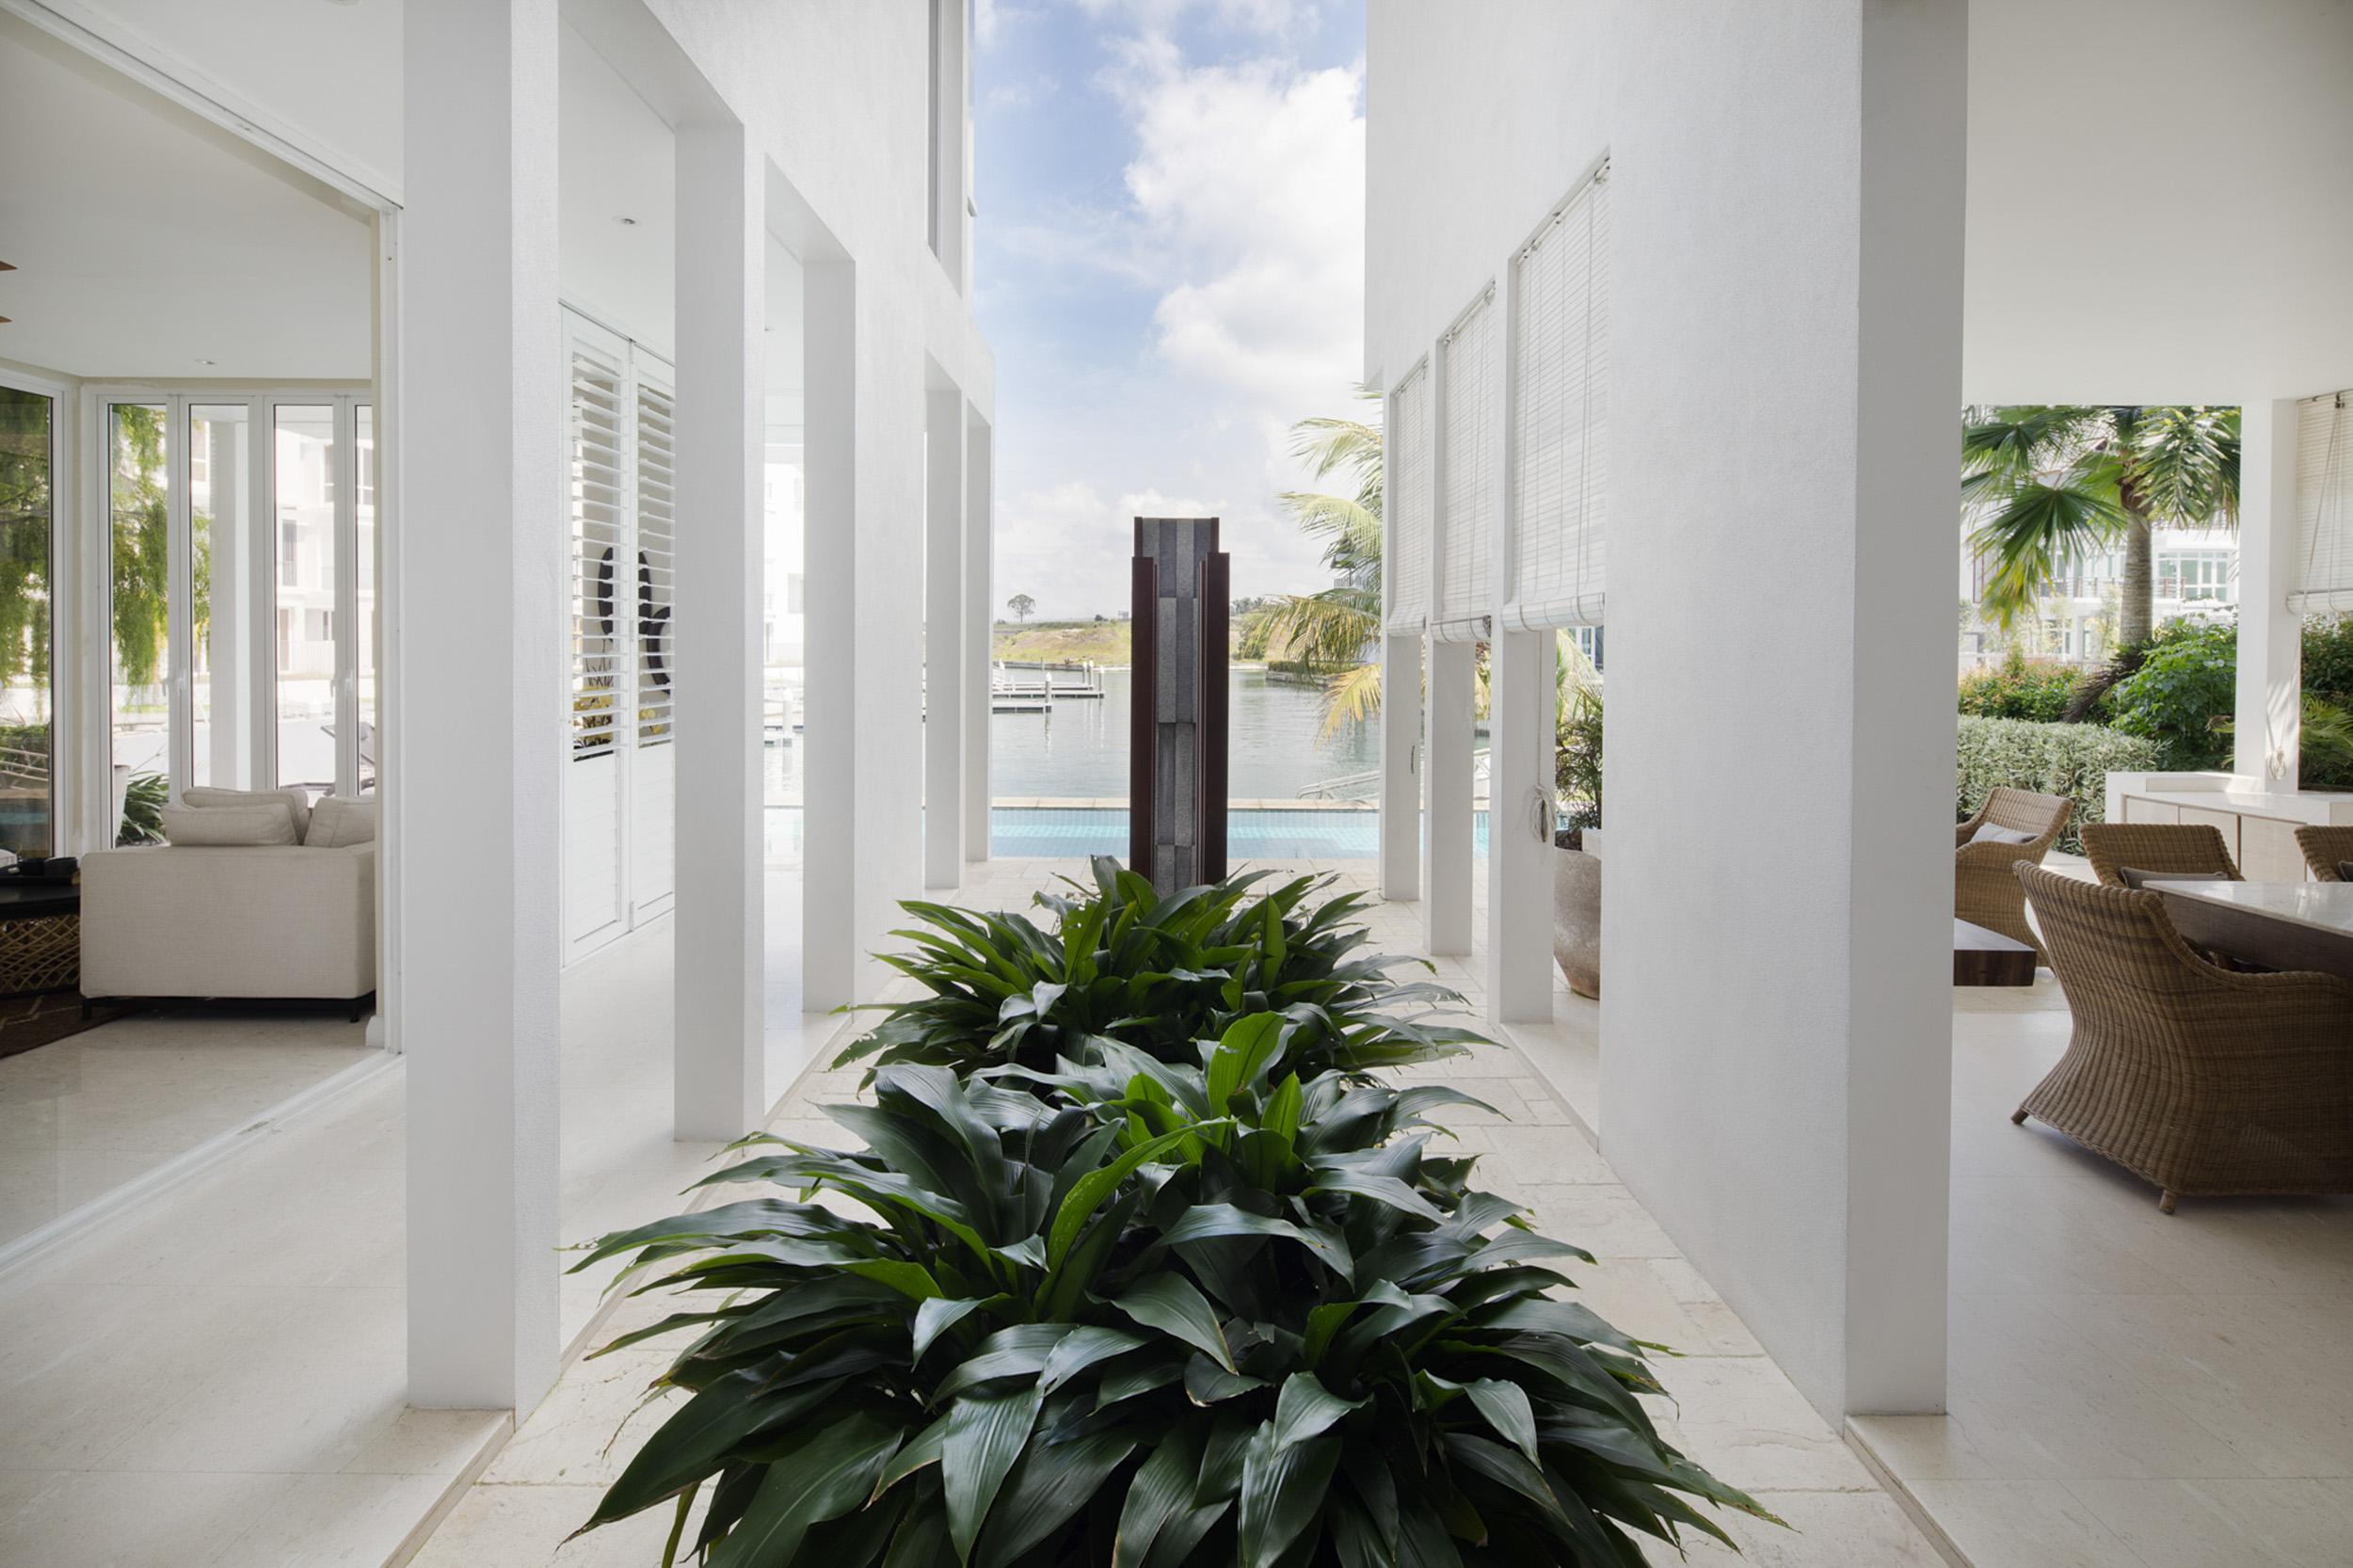 architecture_photography_sydney_australia_120.jpg